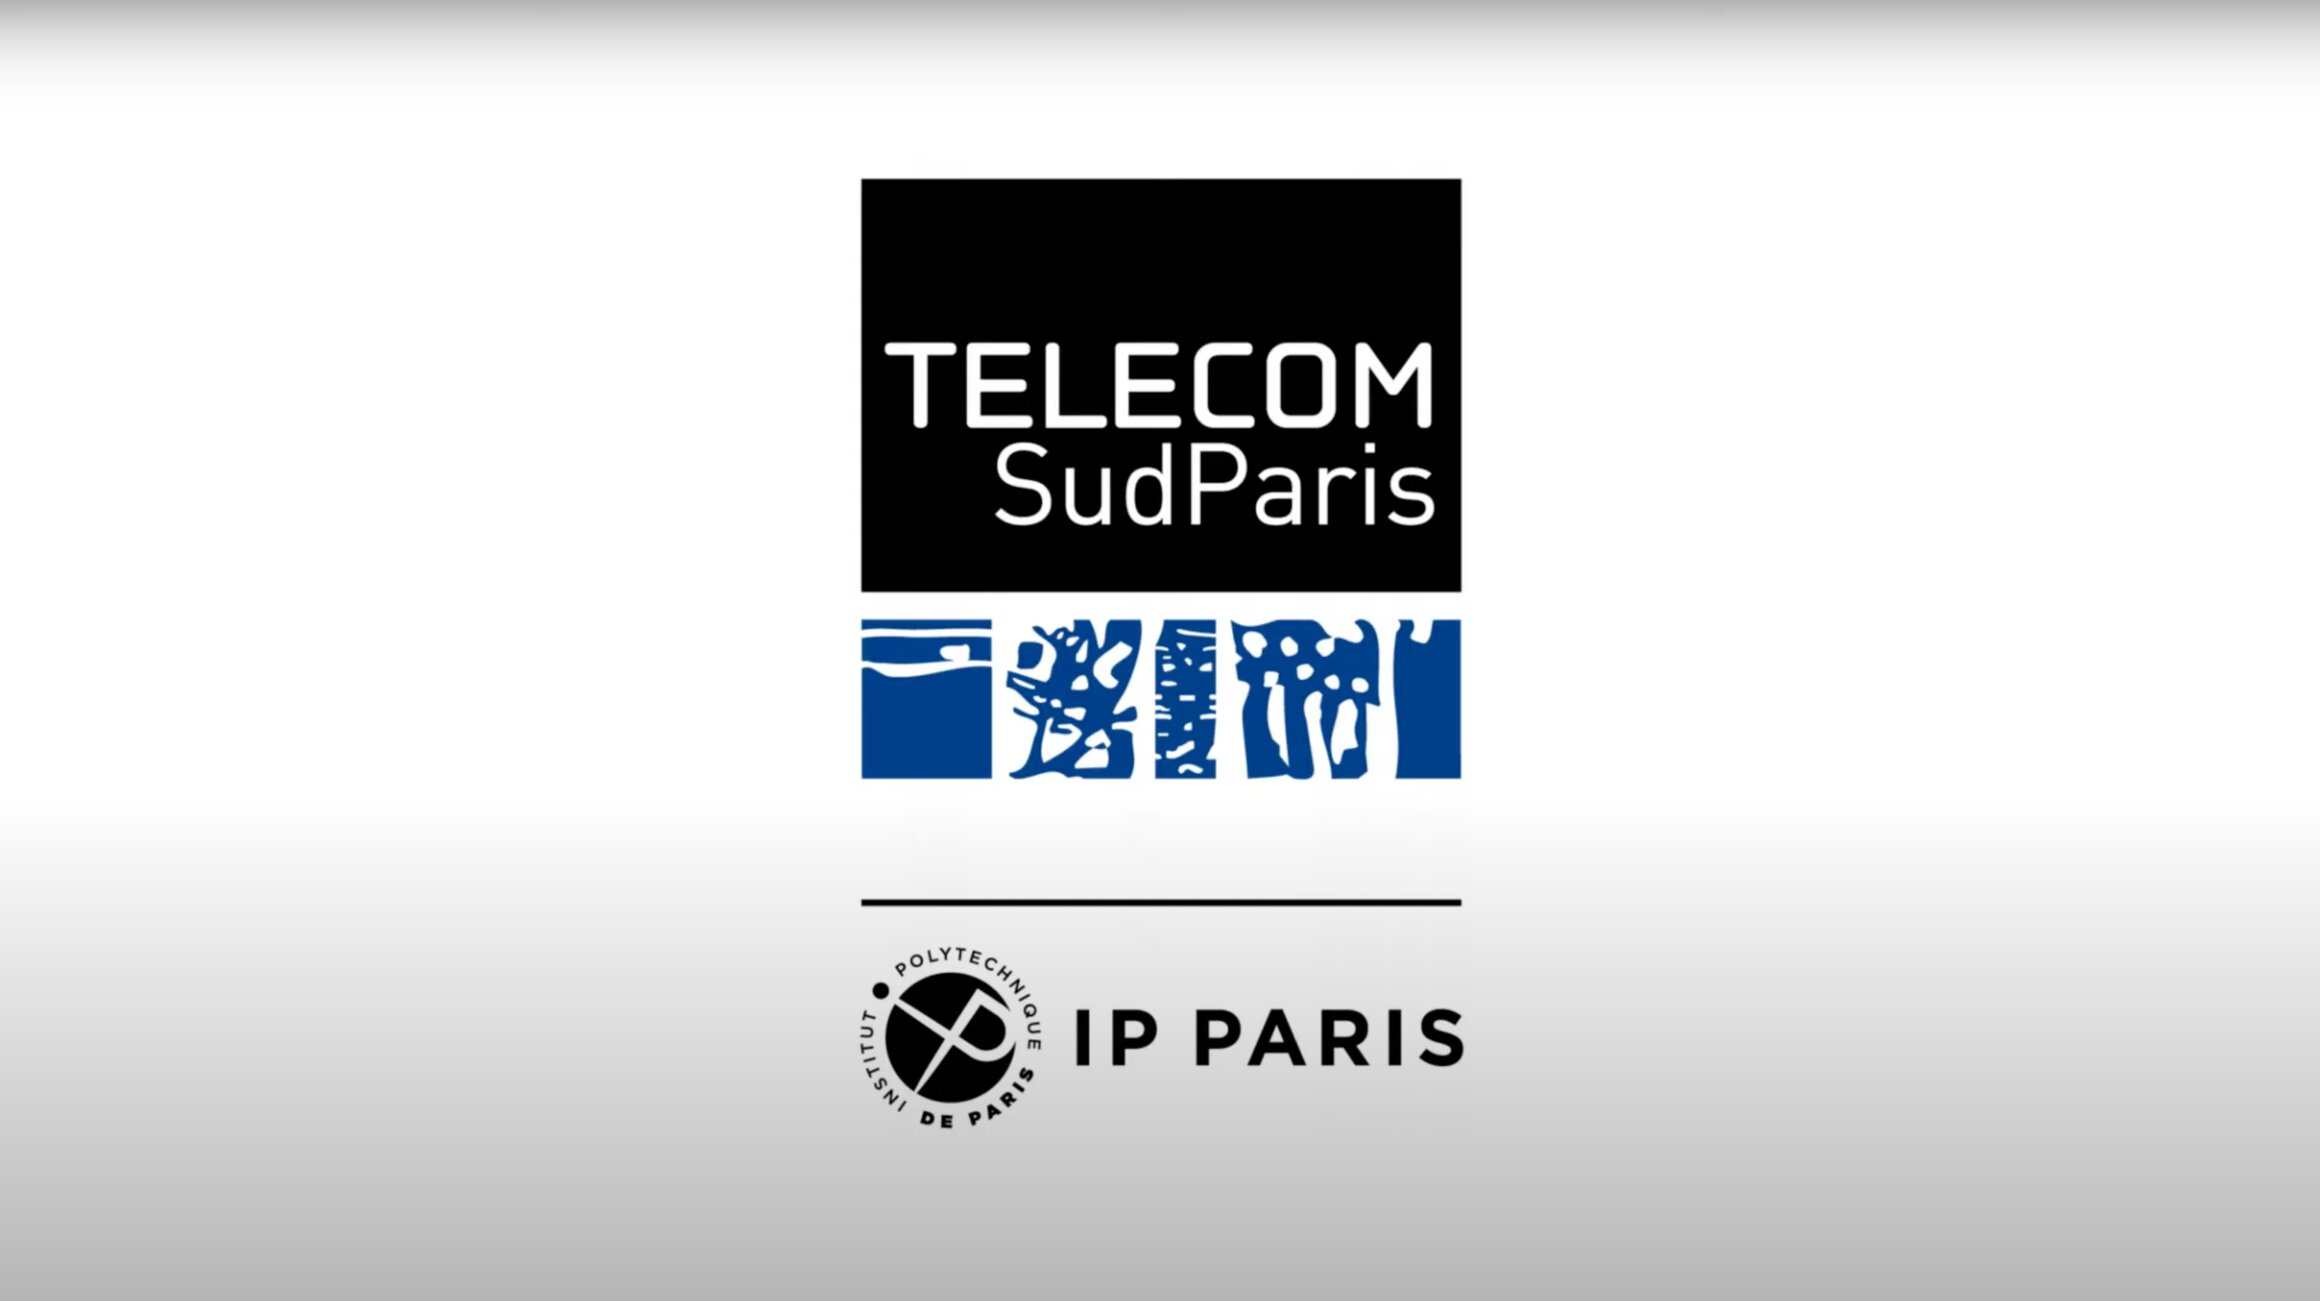 augmented flyer TELECOM SudParis